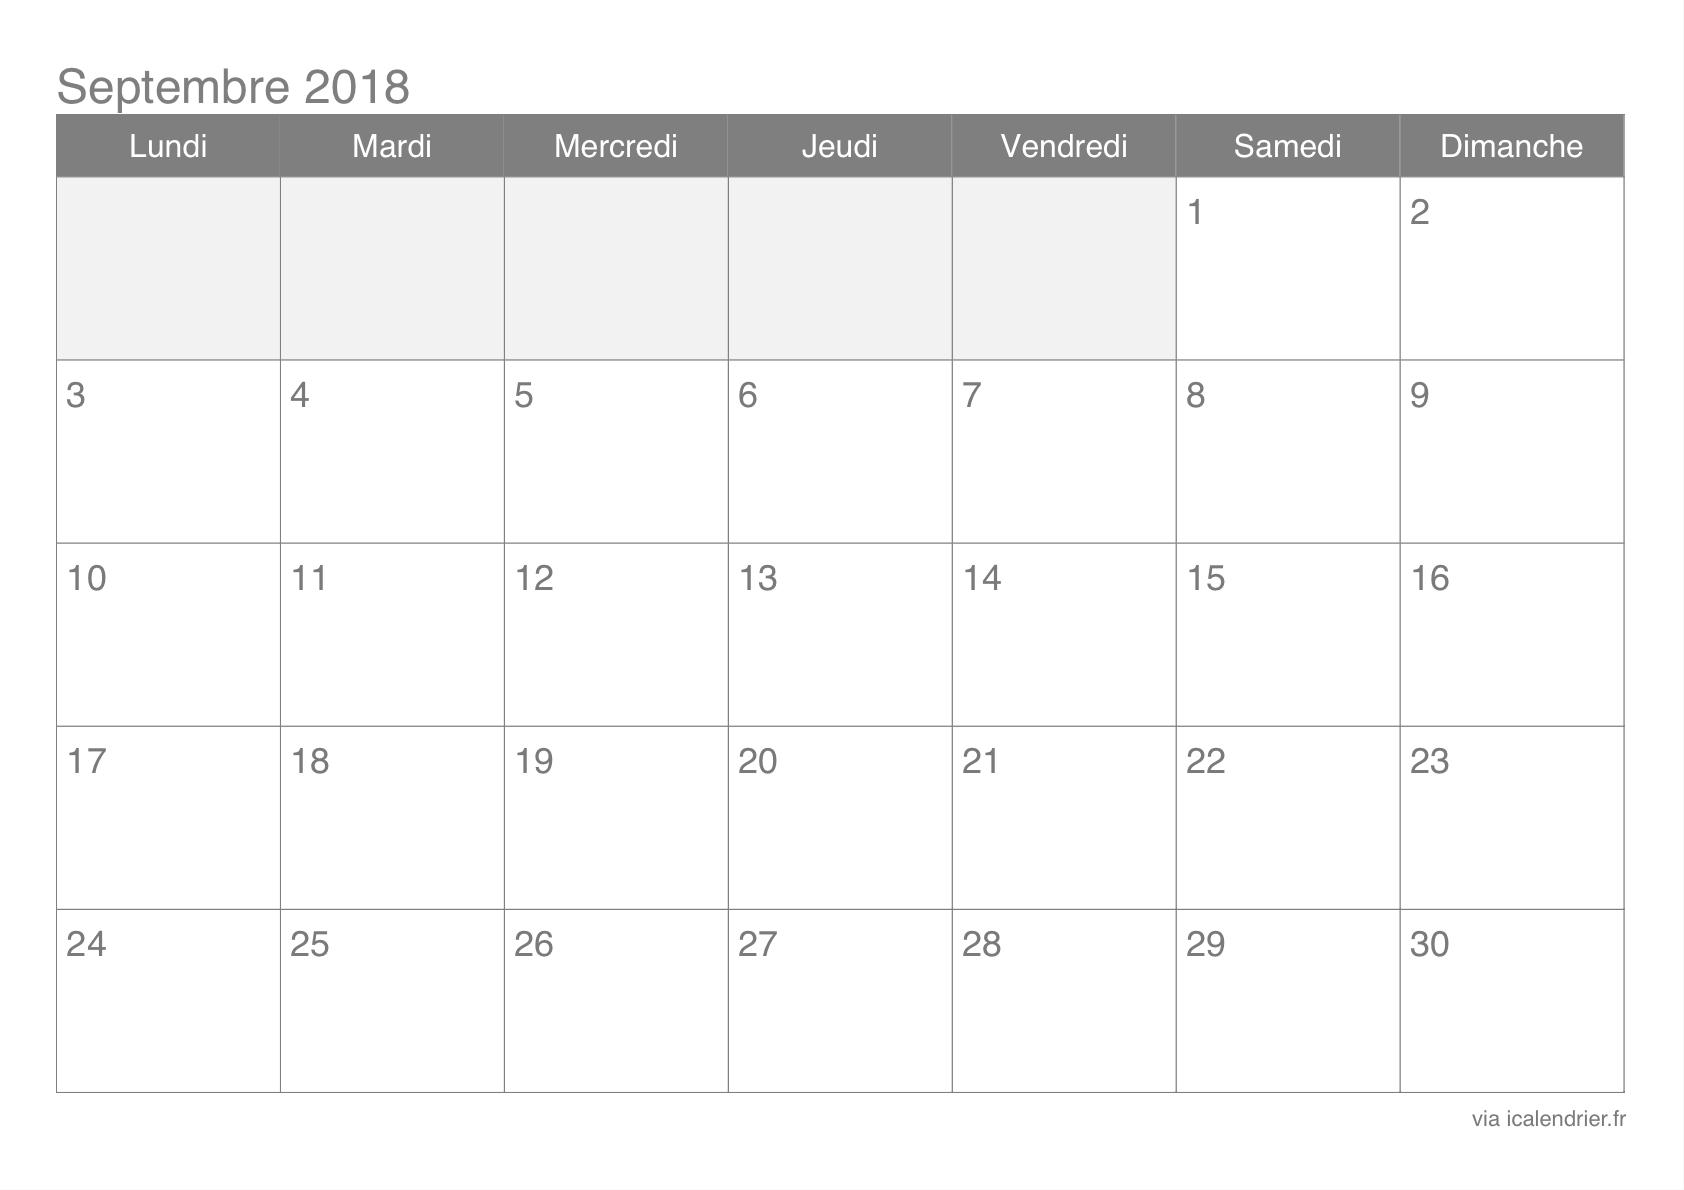 Septembre 2018 Calendrier à Imprimer